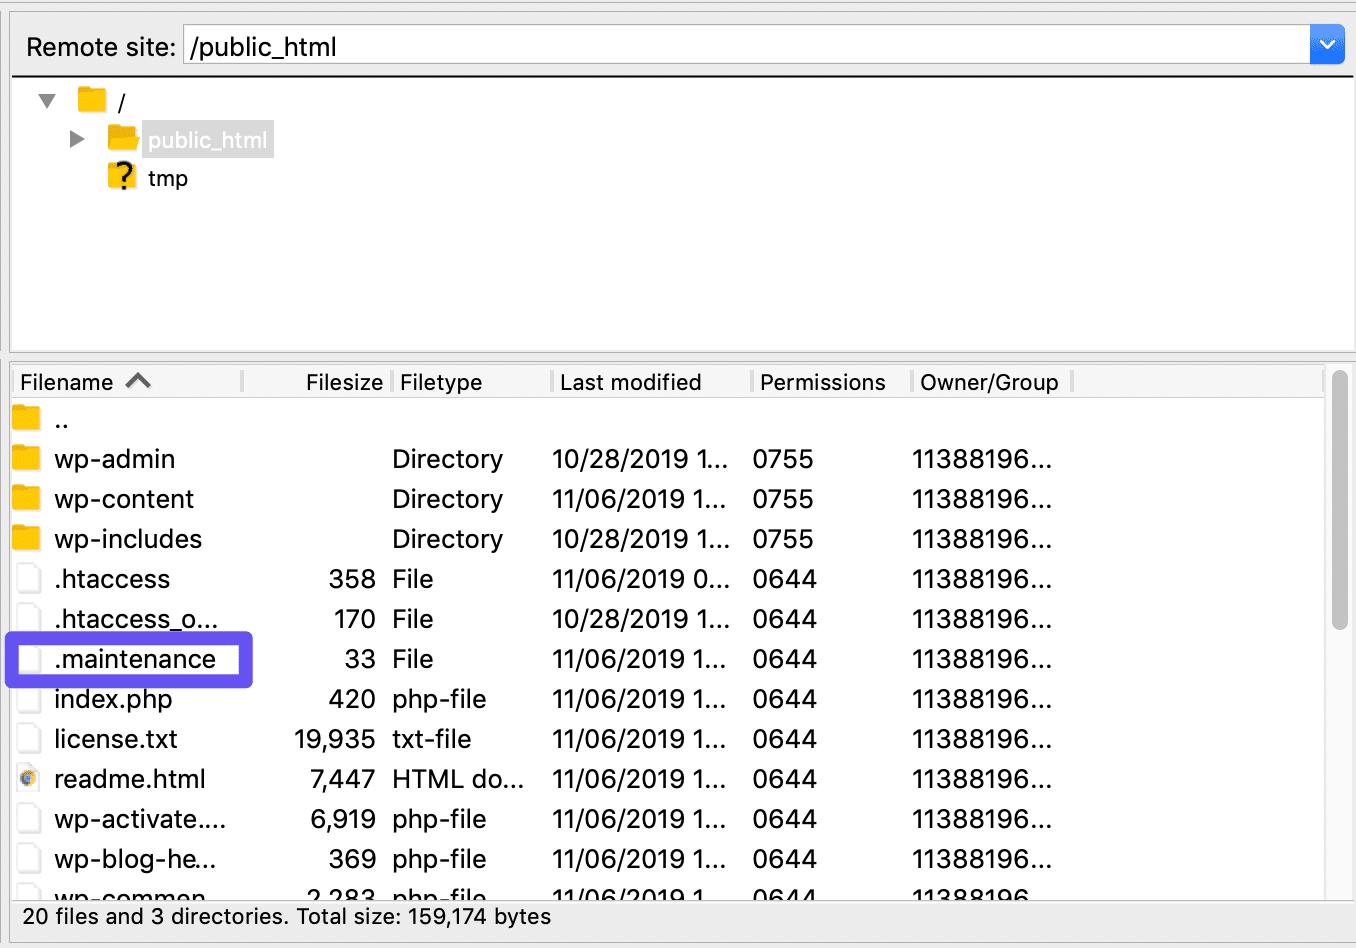 FileZillaの.maintenanceファイル